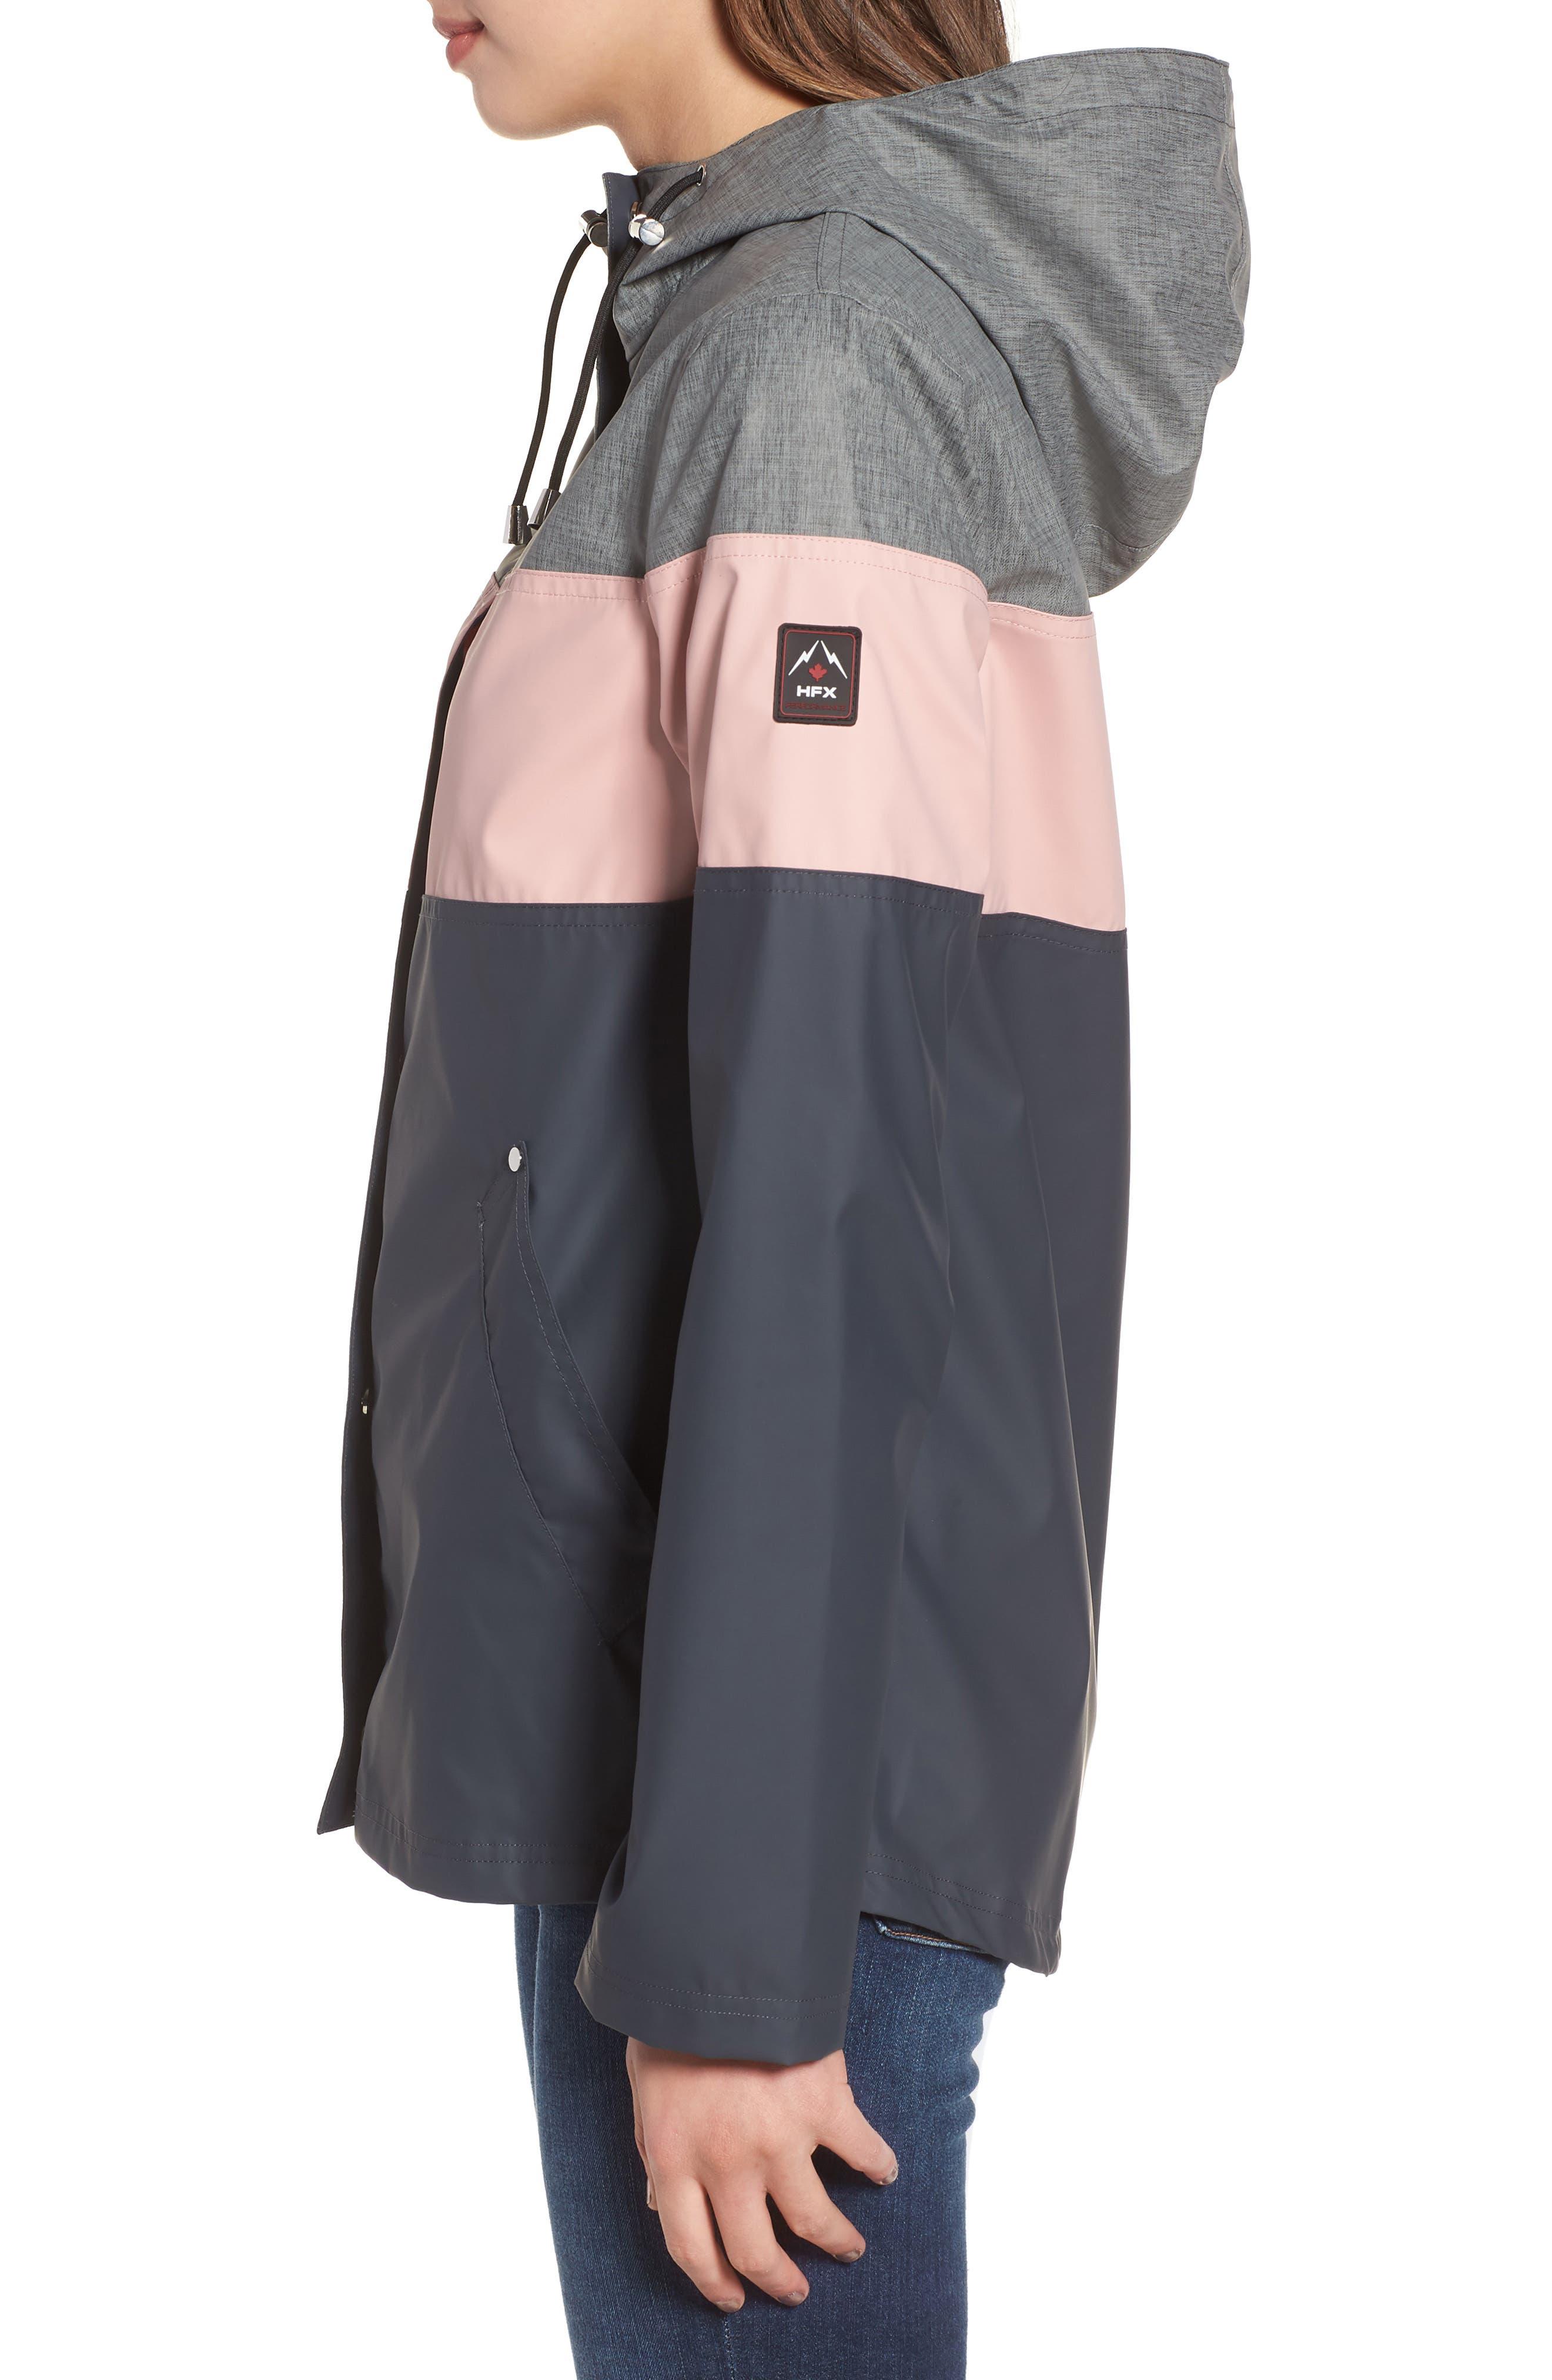 Hooded Raincoat,                             Alternate thumbnail 3, color,                             Storm/ Blush/ Mech Grey